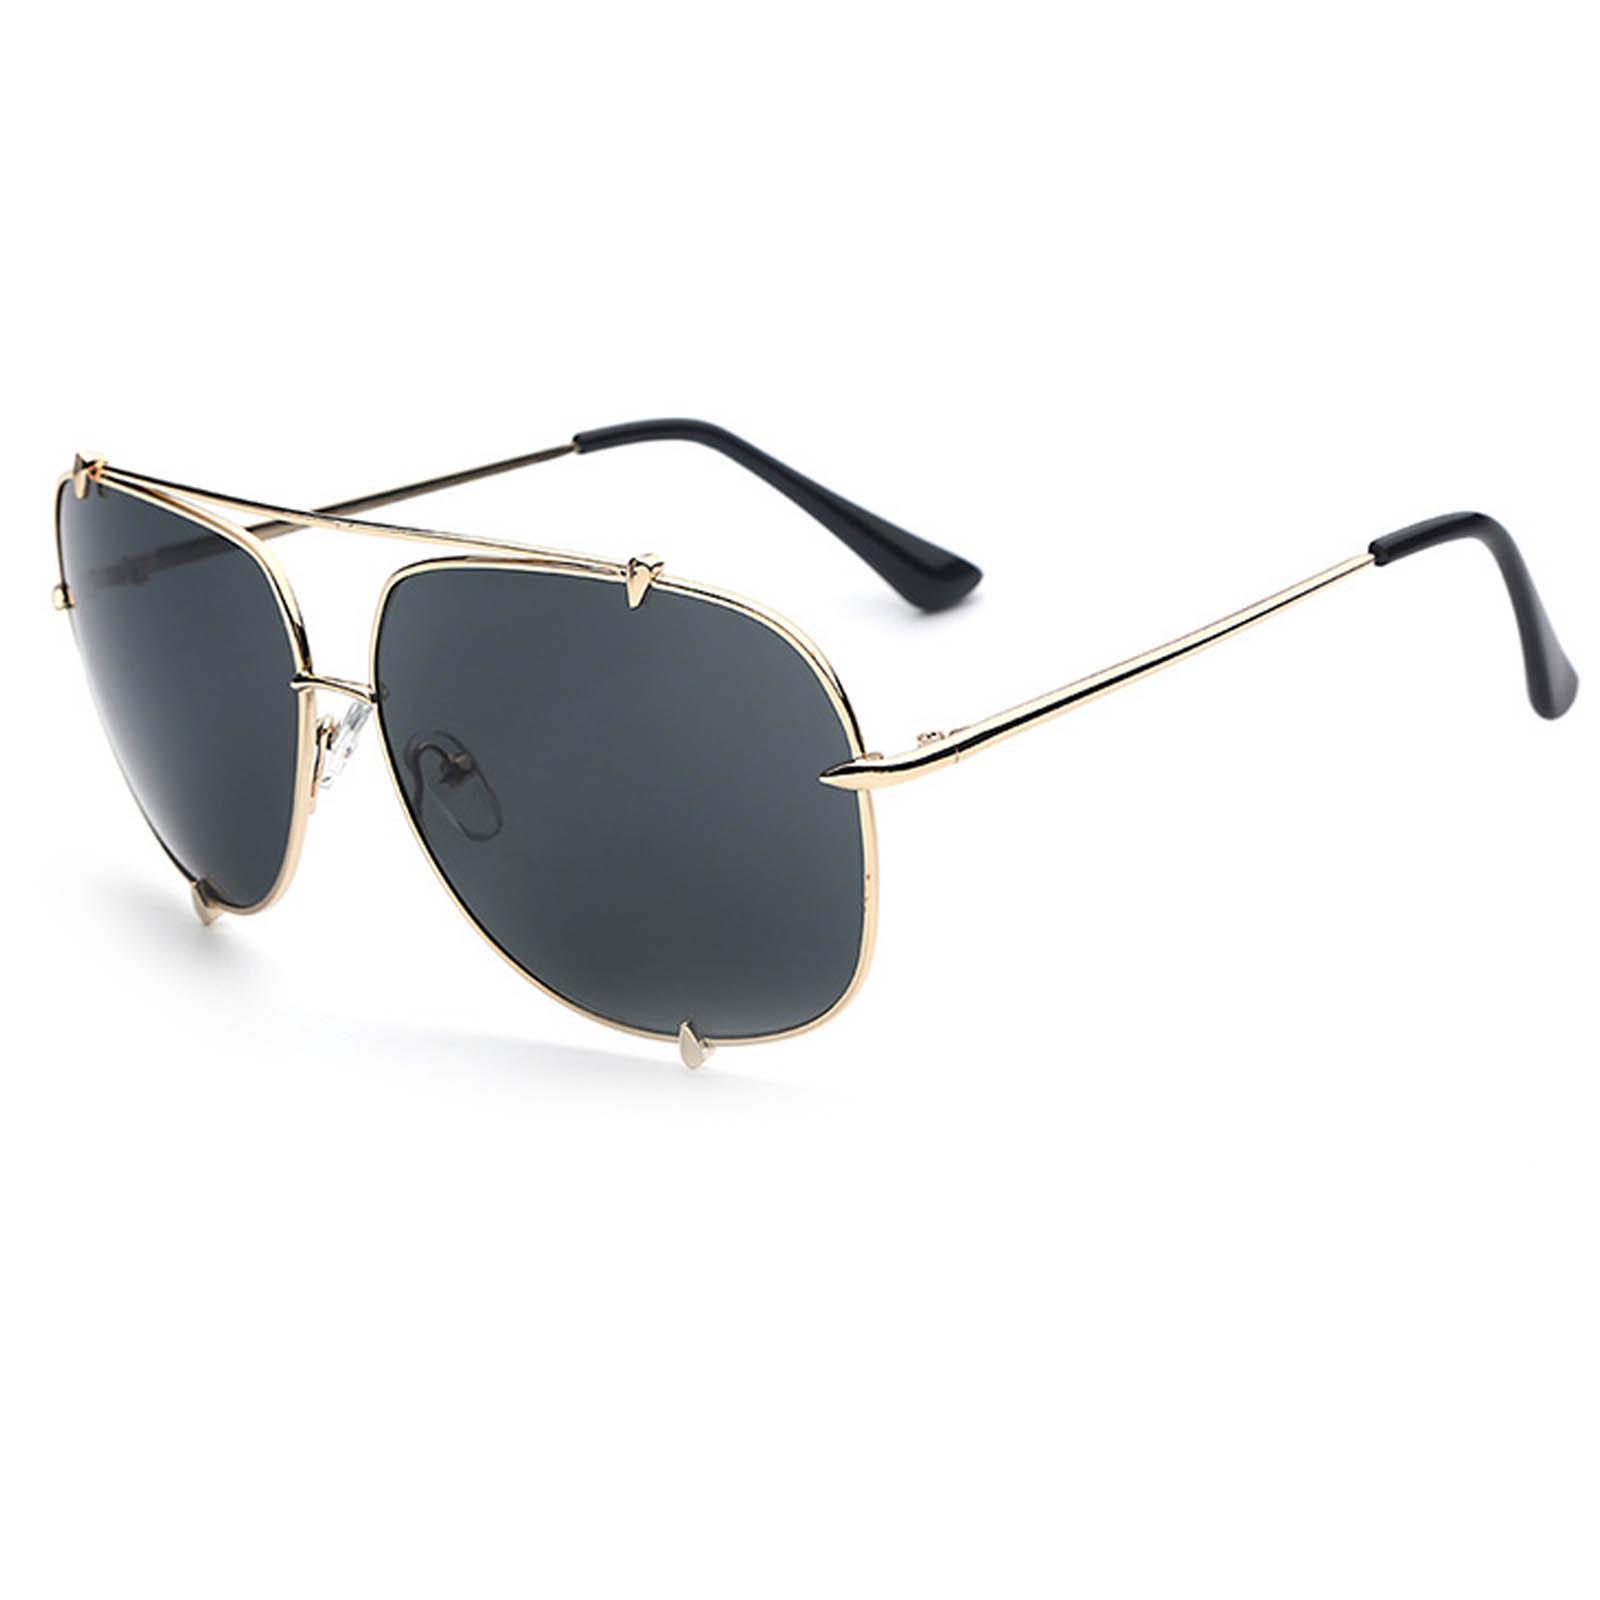 OWL ® 022 C5 Square Eyewear Sunglasses Women's Men's Metal Gold Frame Green Lens One Pair